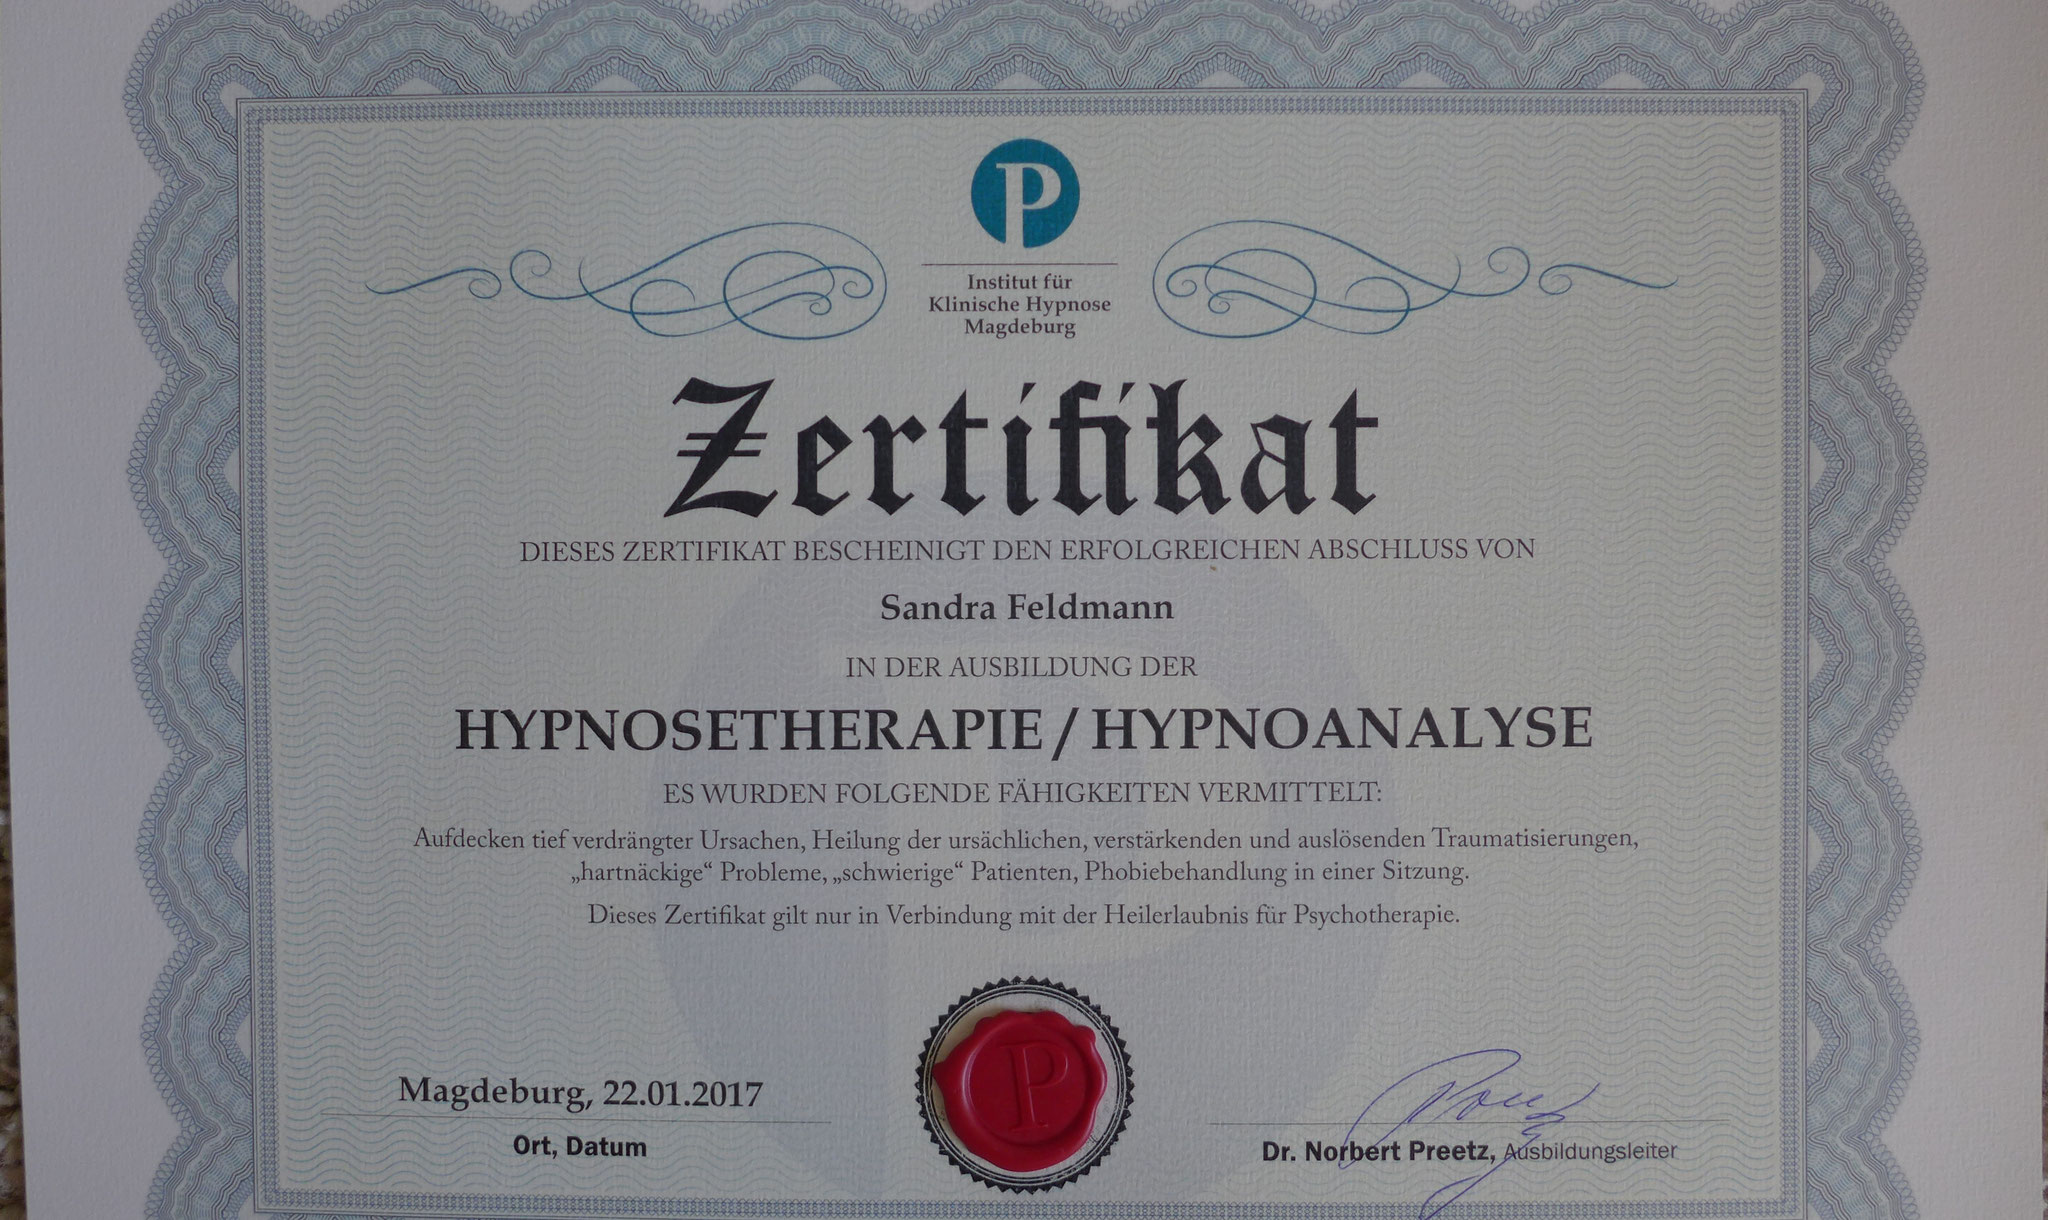 Hypnosetherapie / Hypnosanalyse,  Dr. Norbert Preetz